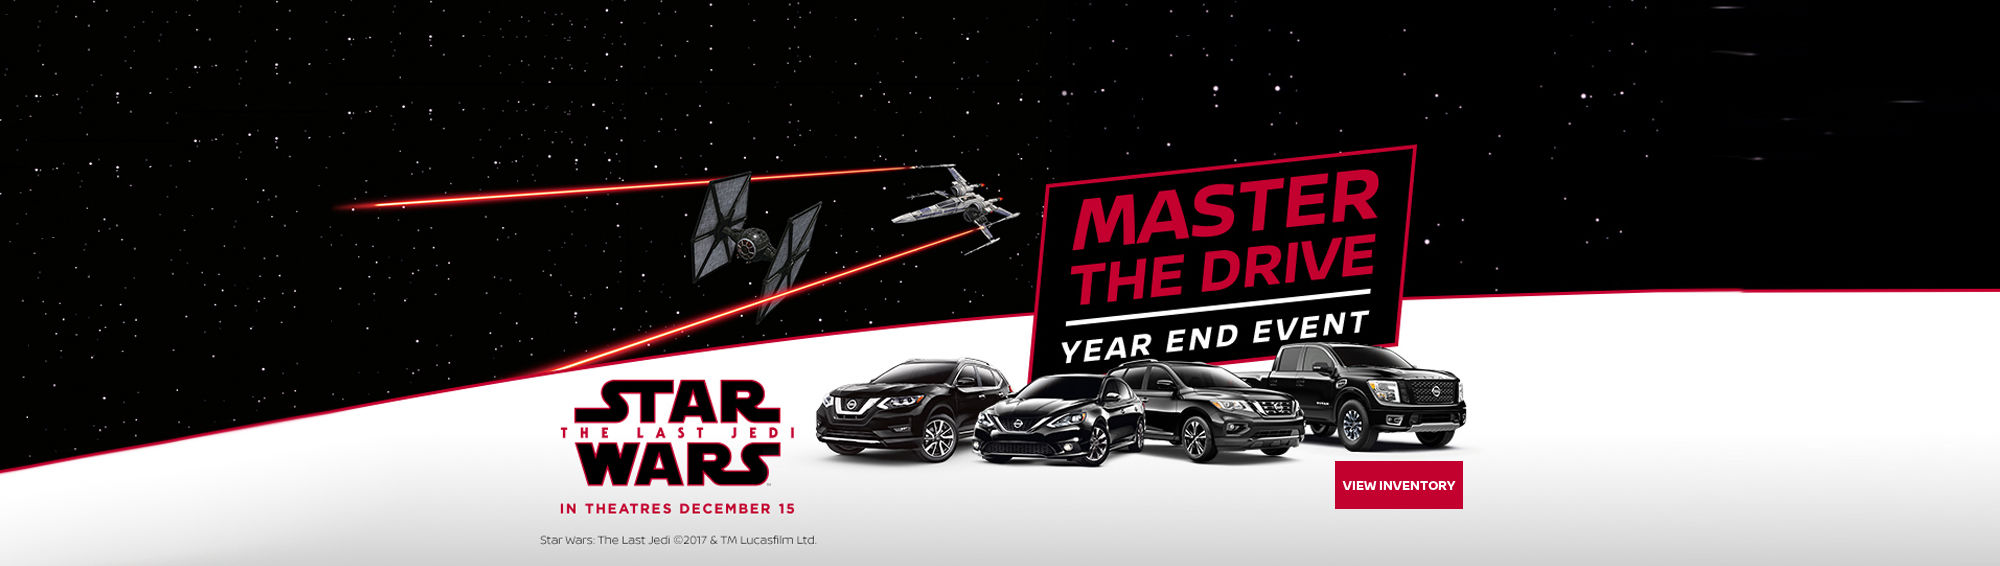 Master The Drive (November 17) Desktop